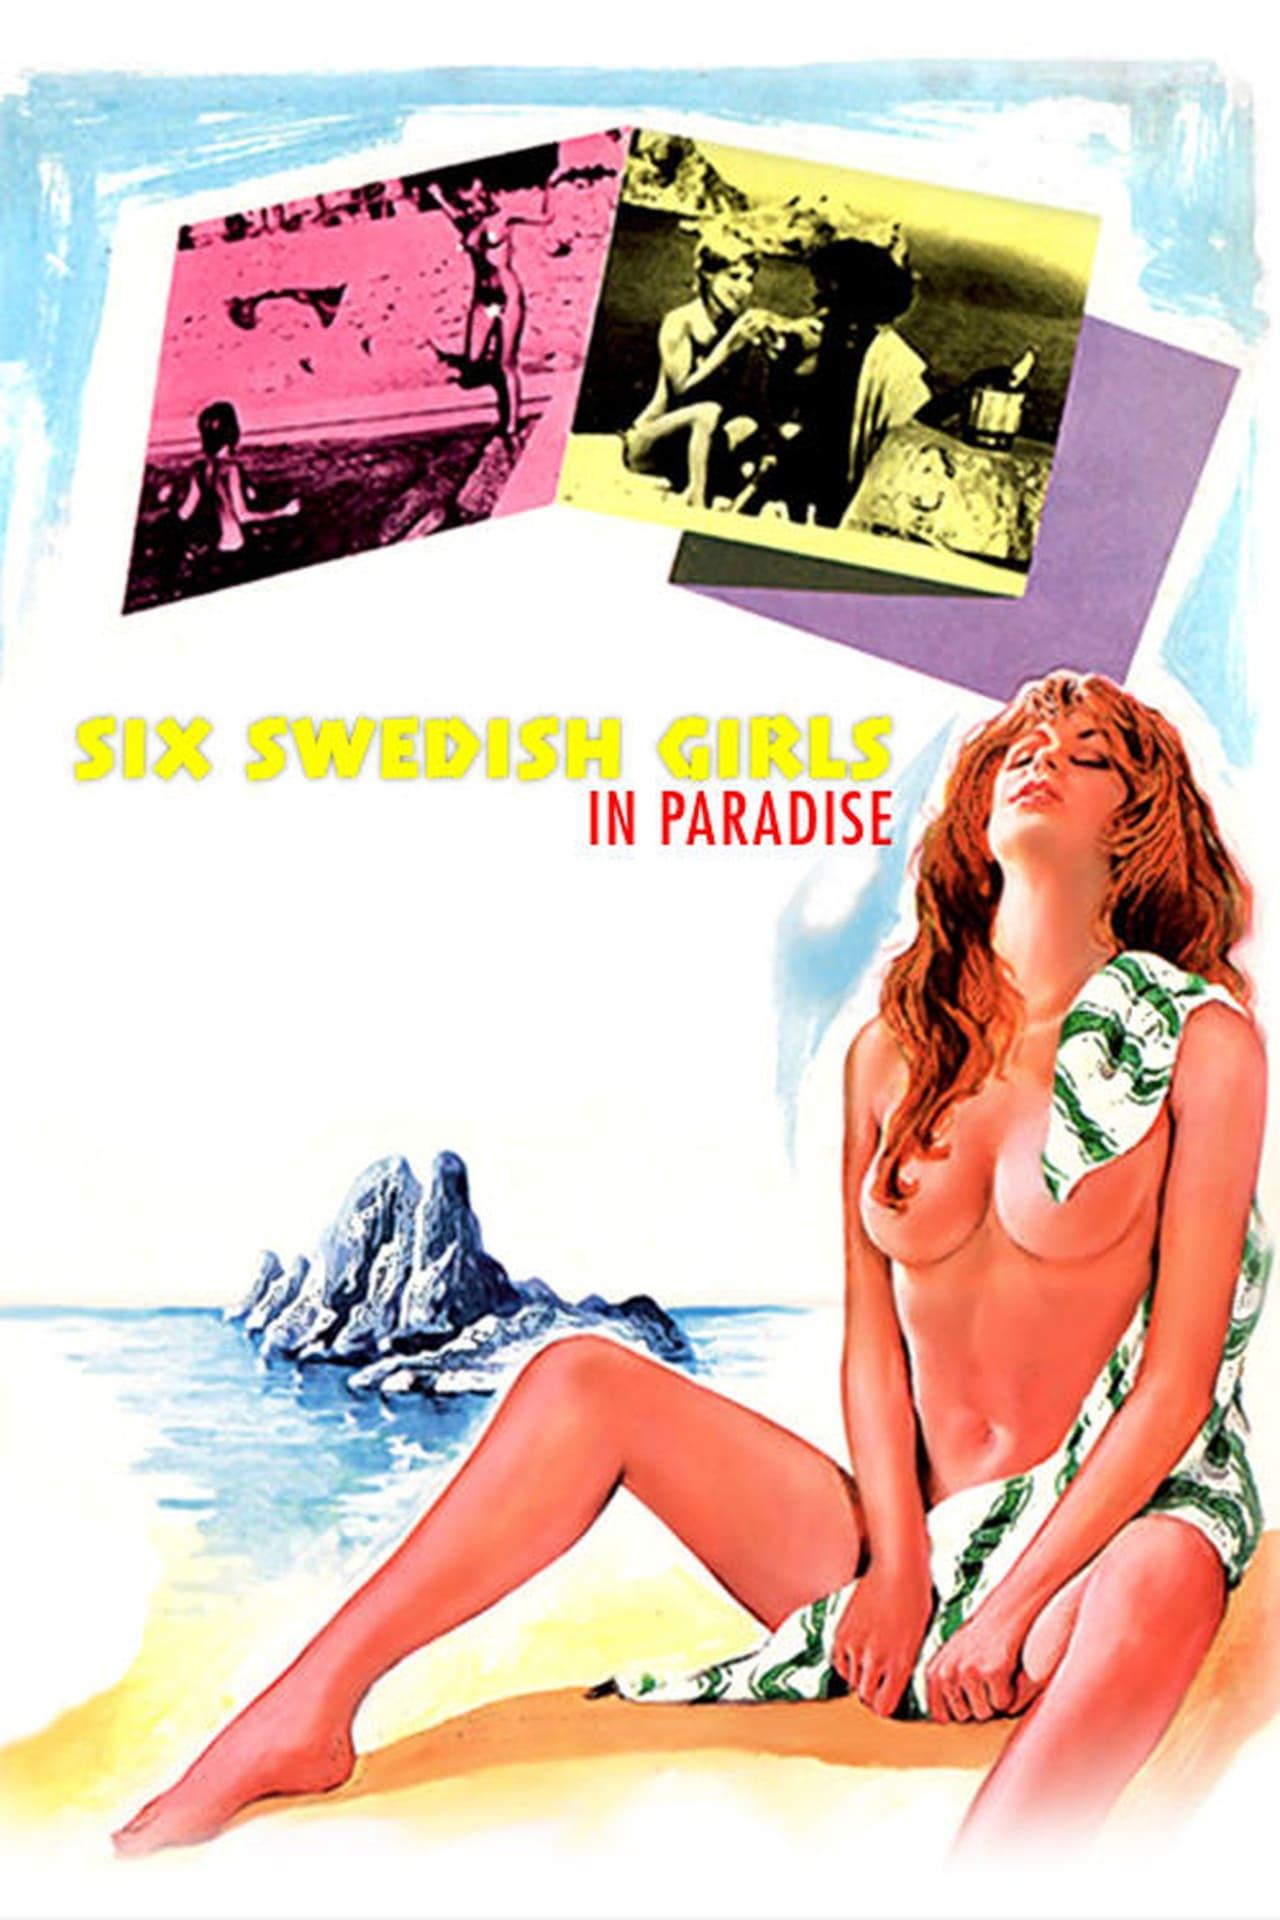 Six Swedish Girls on Ibiza